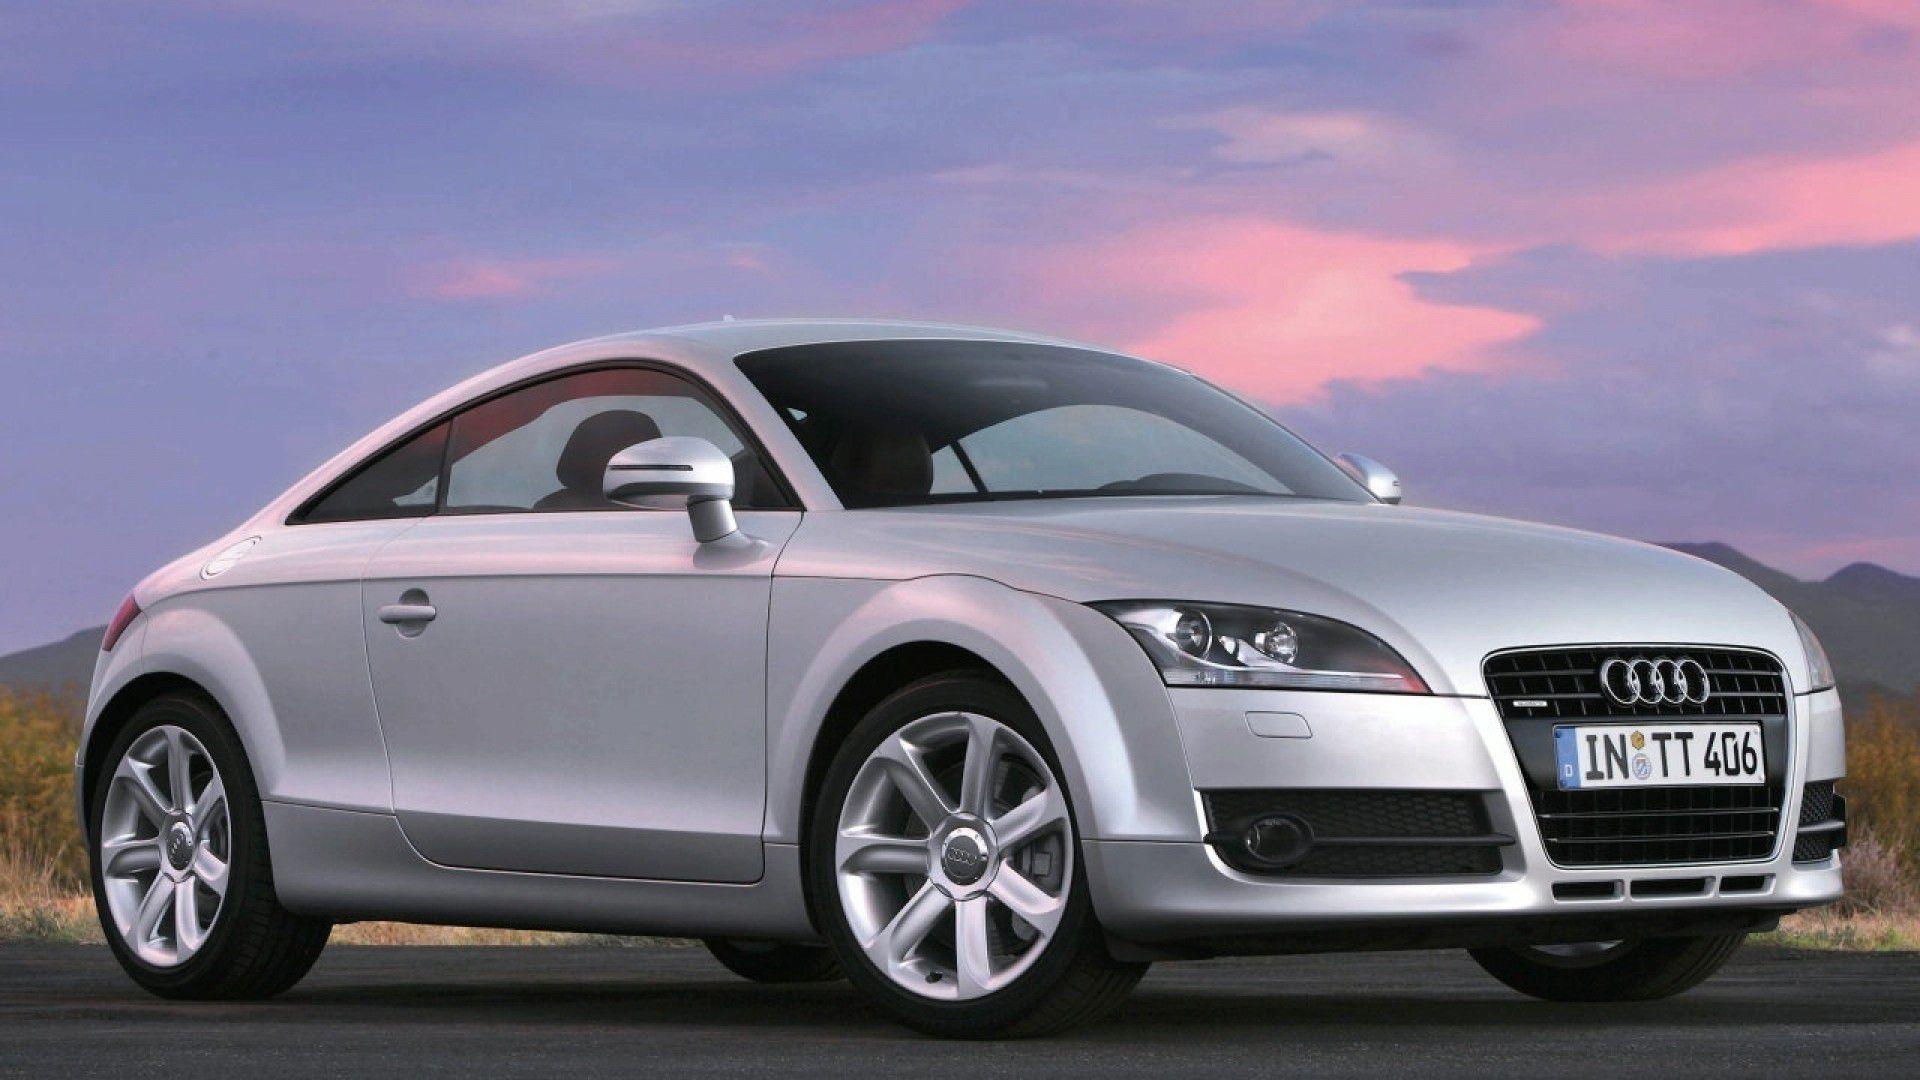 Audi TTS (2008 to Present)